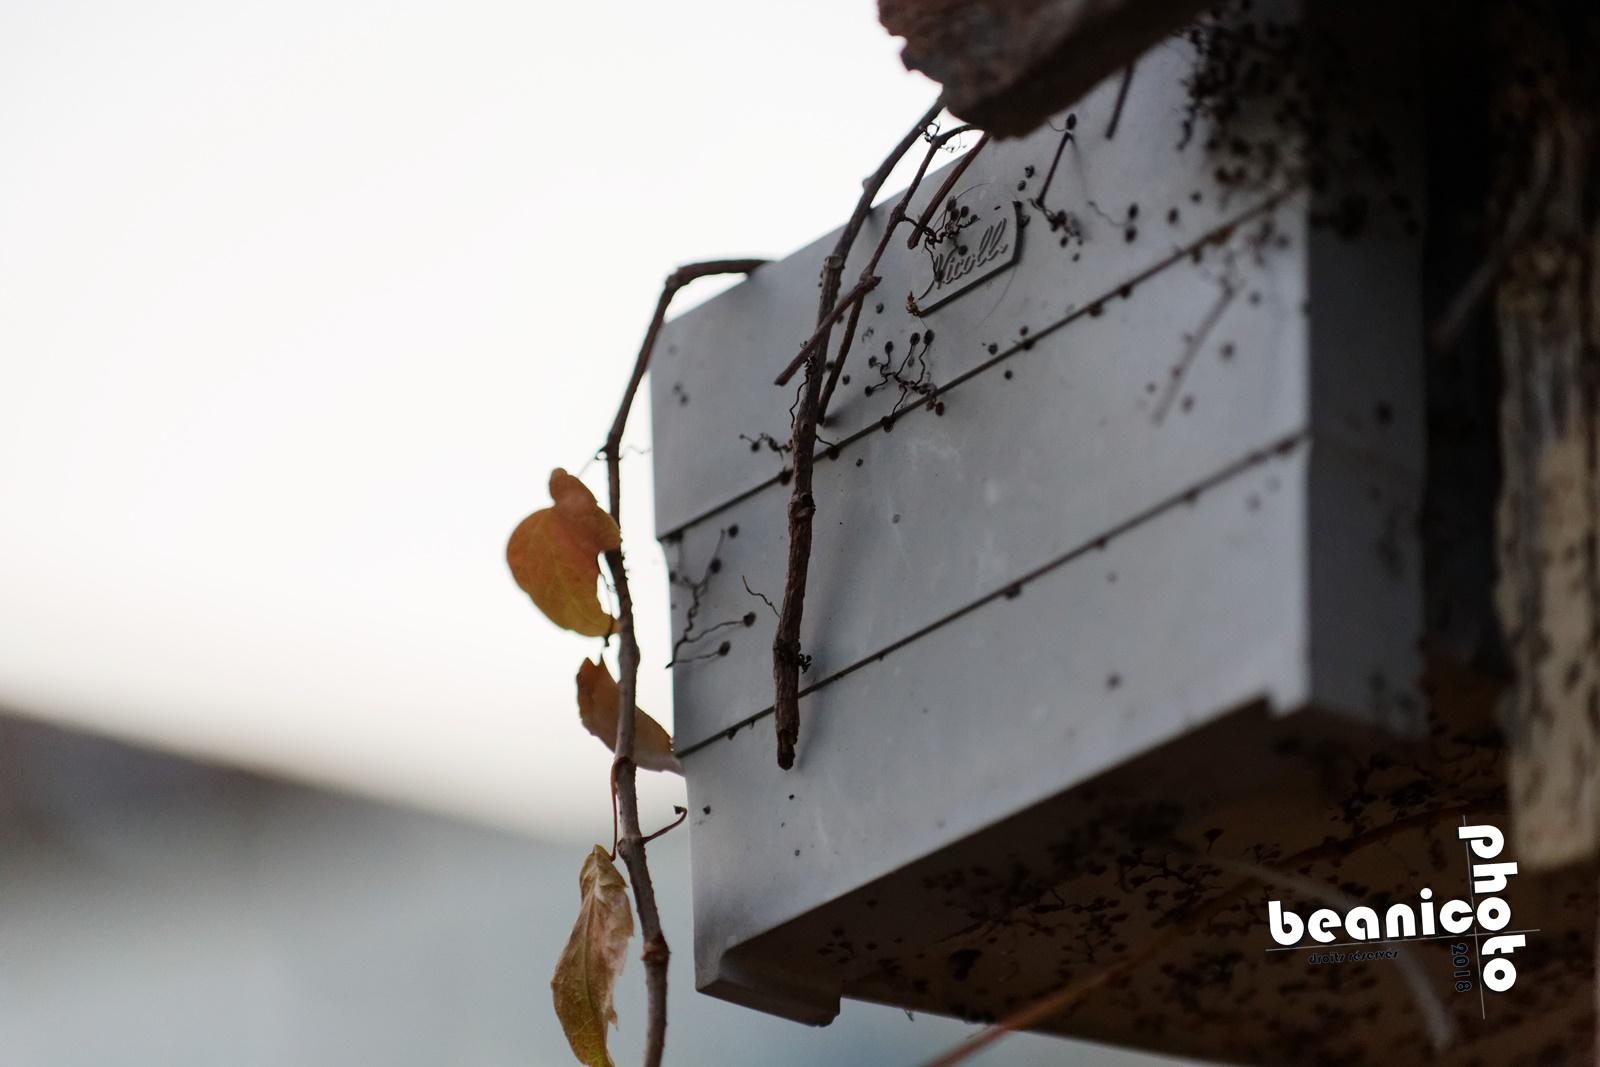 beanico-photo - détail - Canon 5D IV + Tamron 90mm macro + Kenko 1,5x